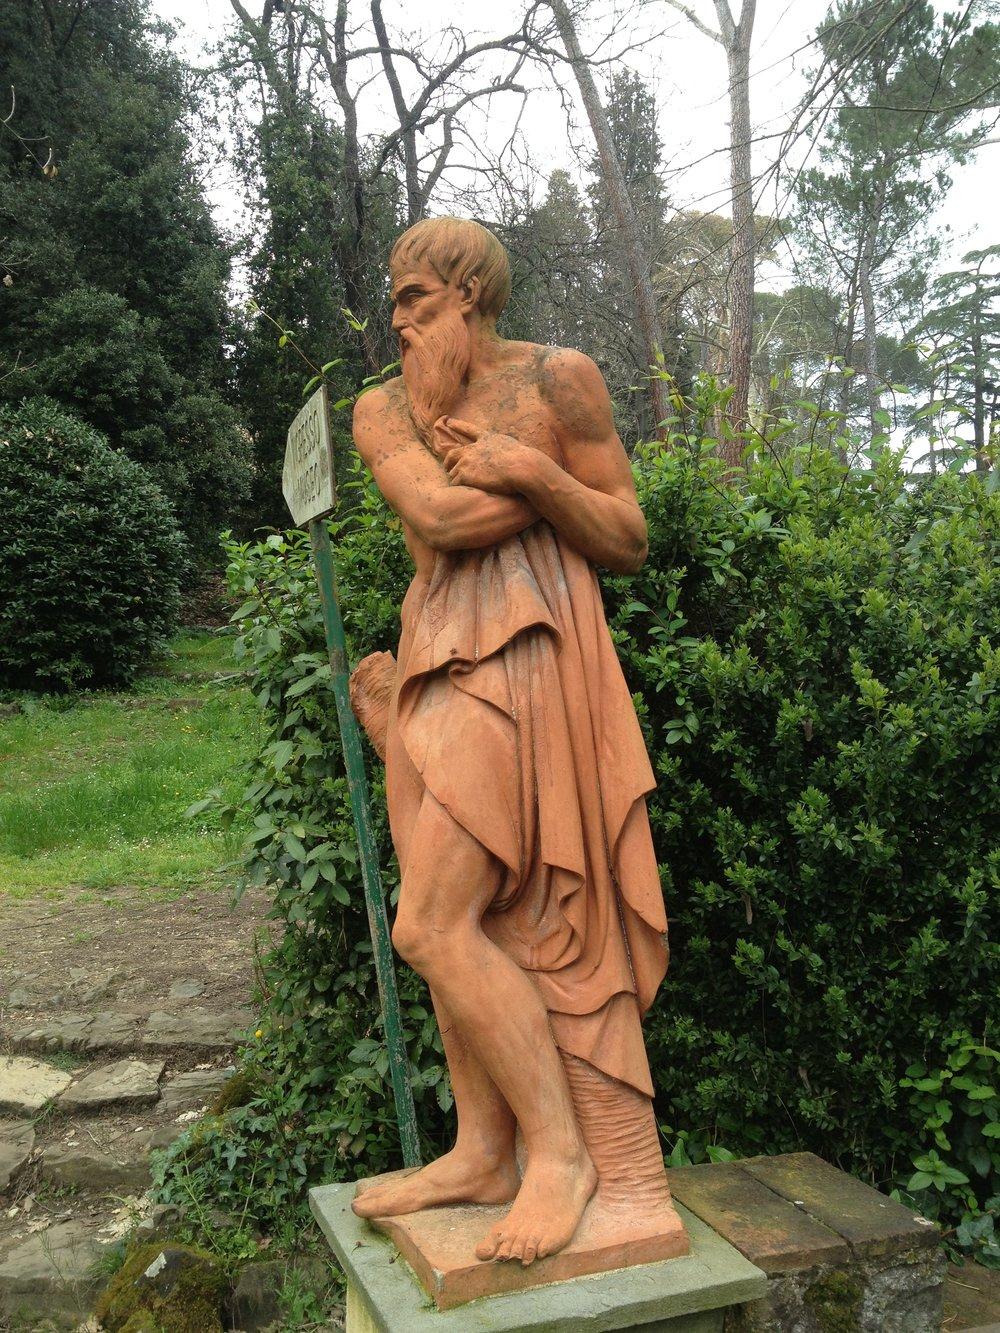 Pseudoithyphallic-iconography-statues-jessewaugh.com-13,jpg